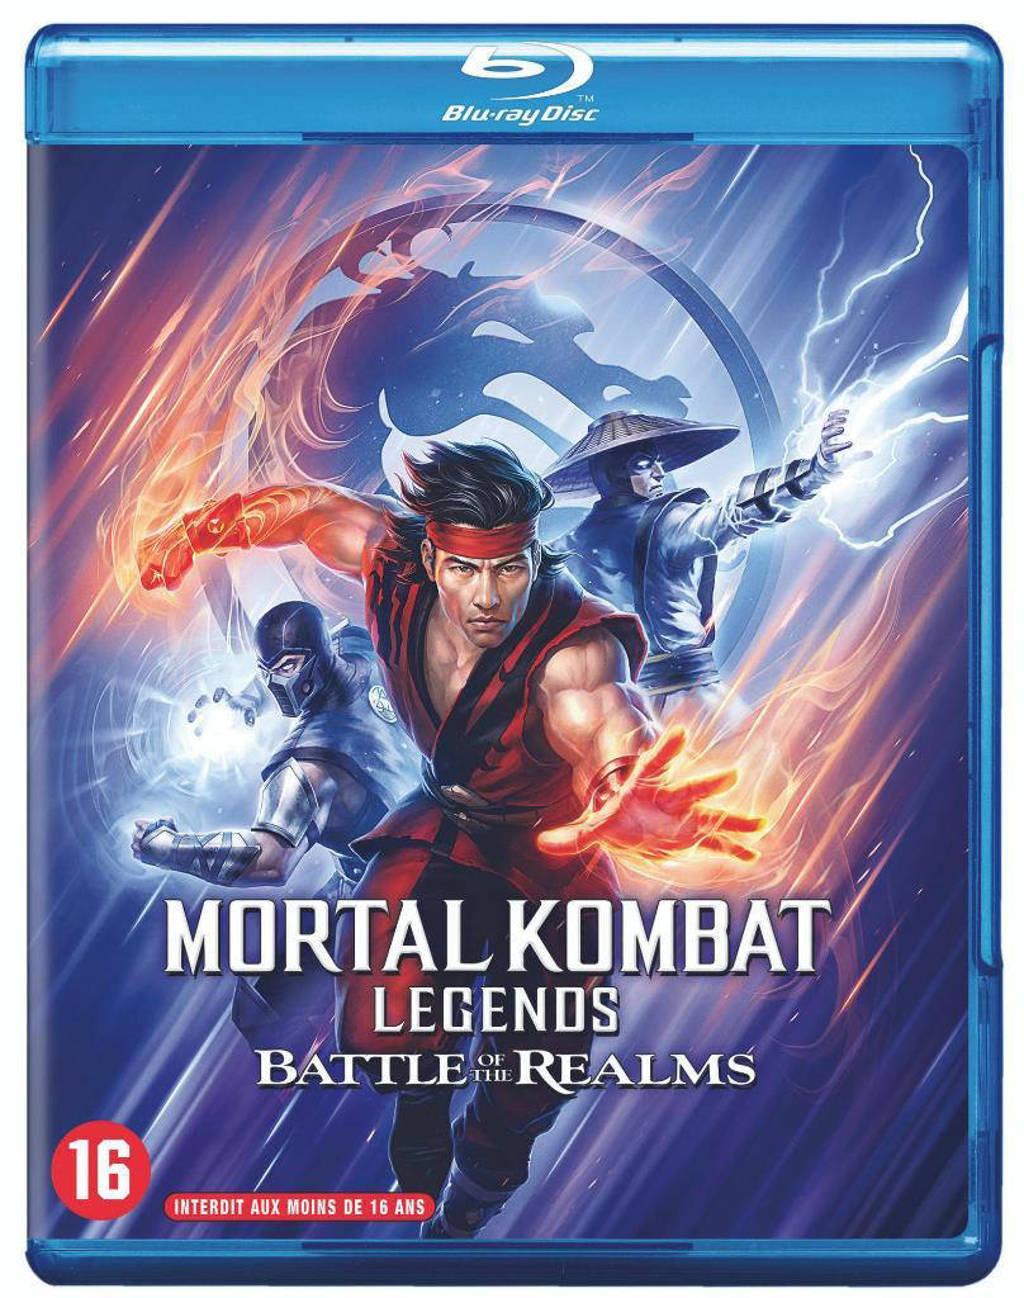 Mortal Kombat - Battle of the Realms (Blu-ray)